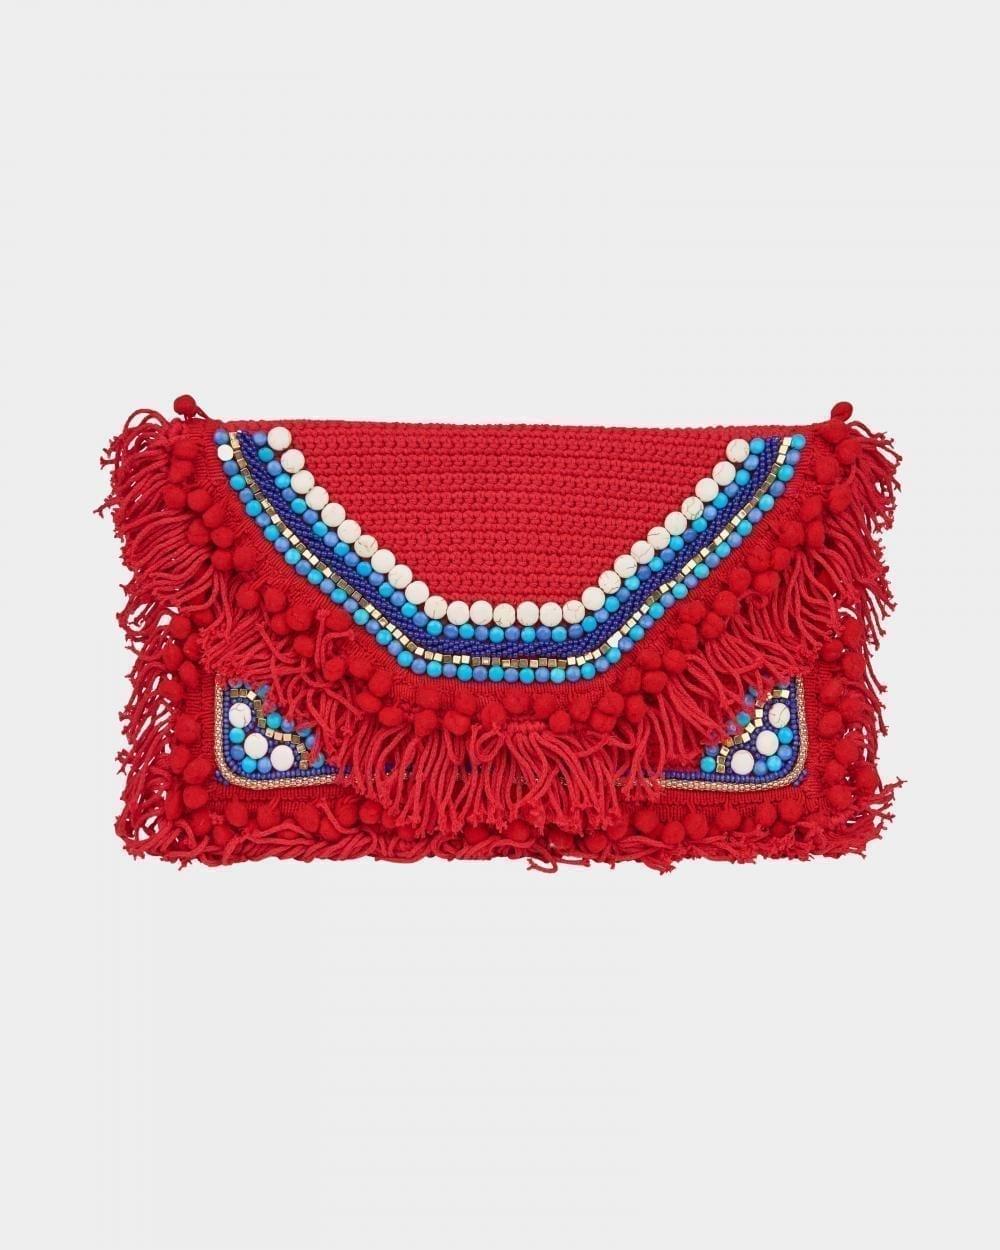 Signature Gypsy Red Clutch